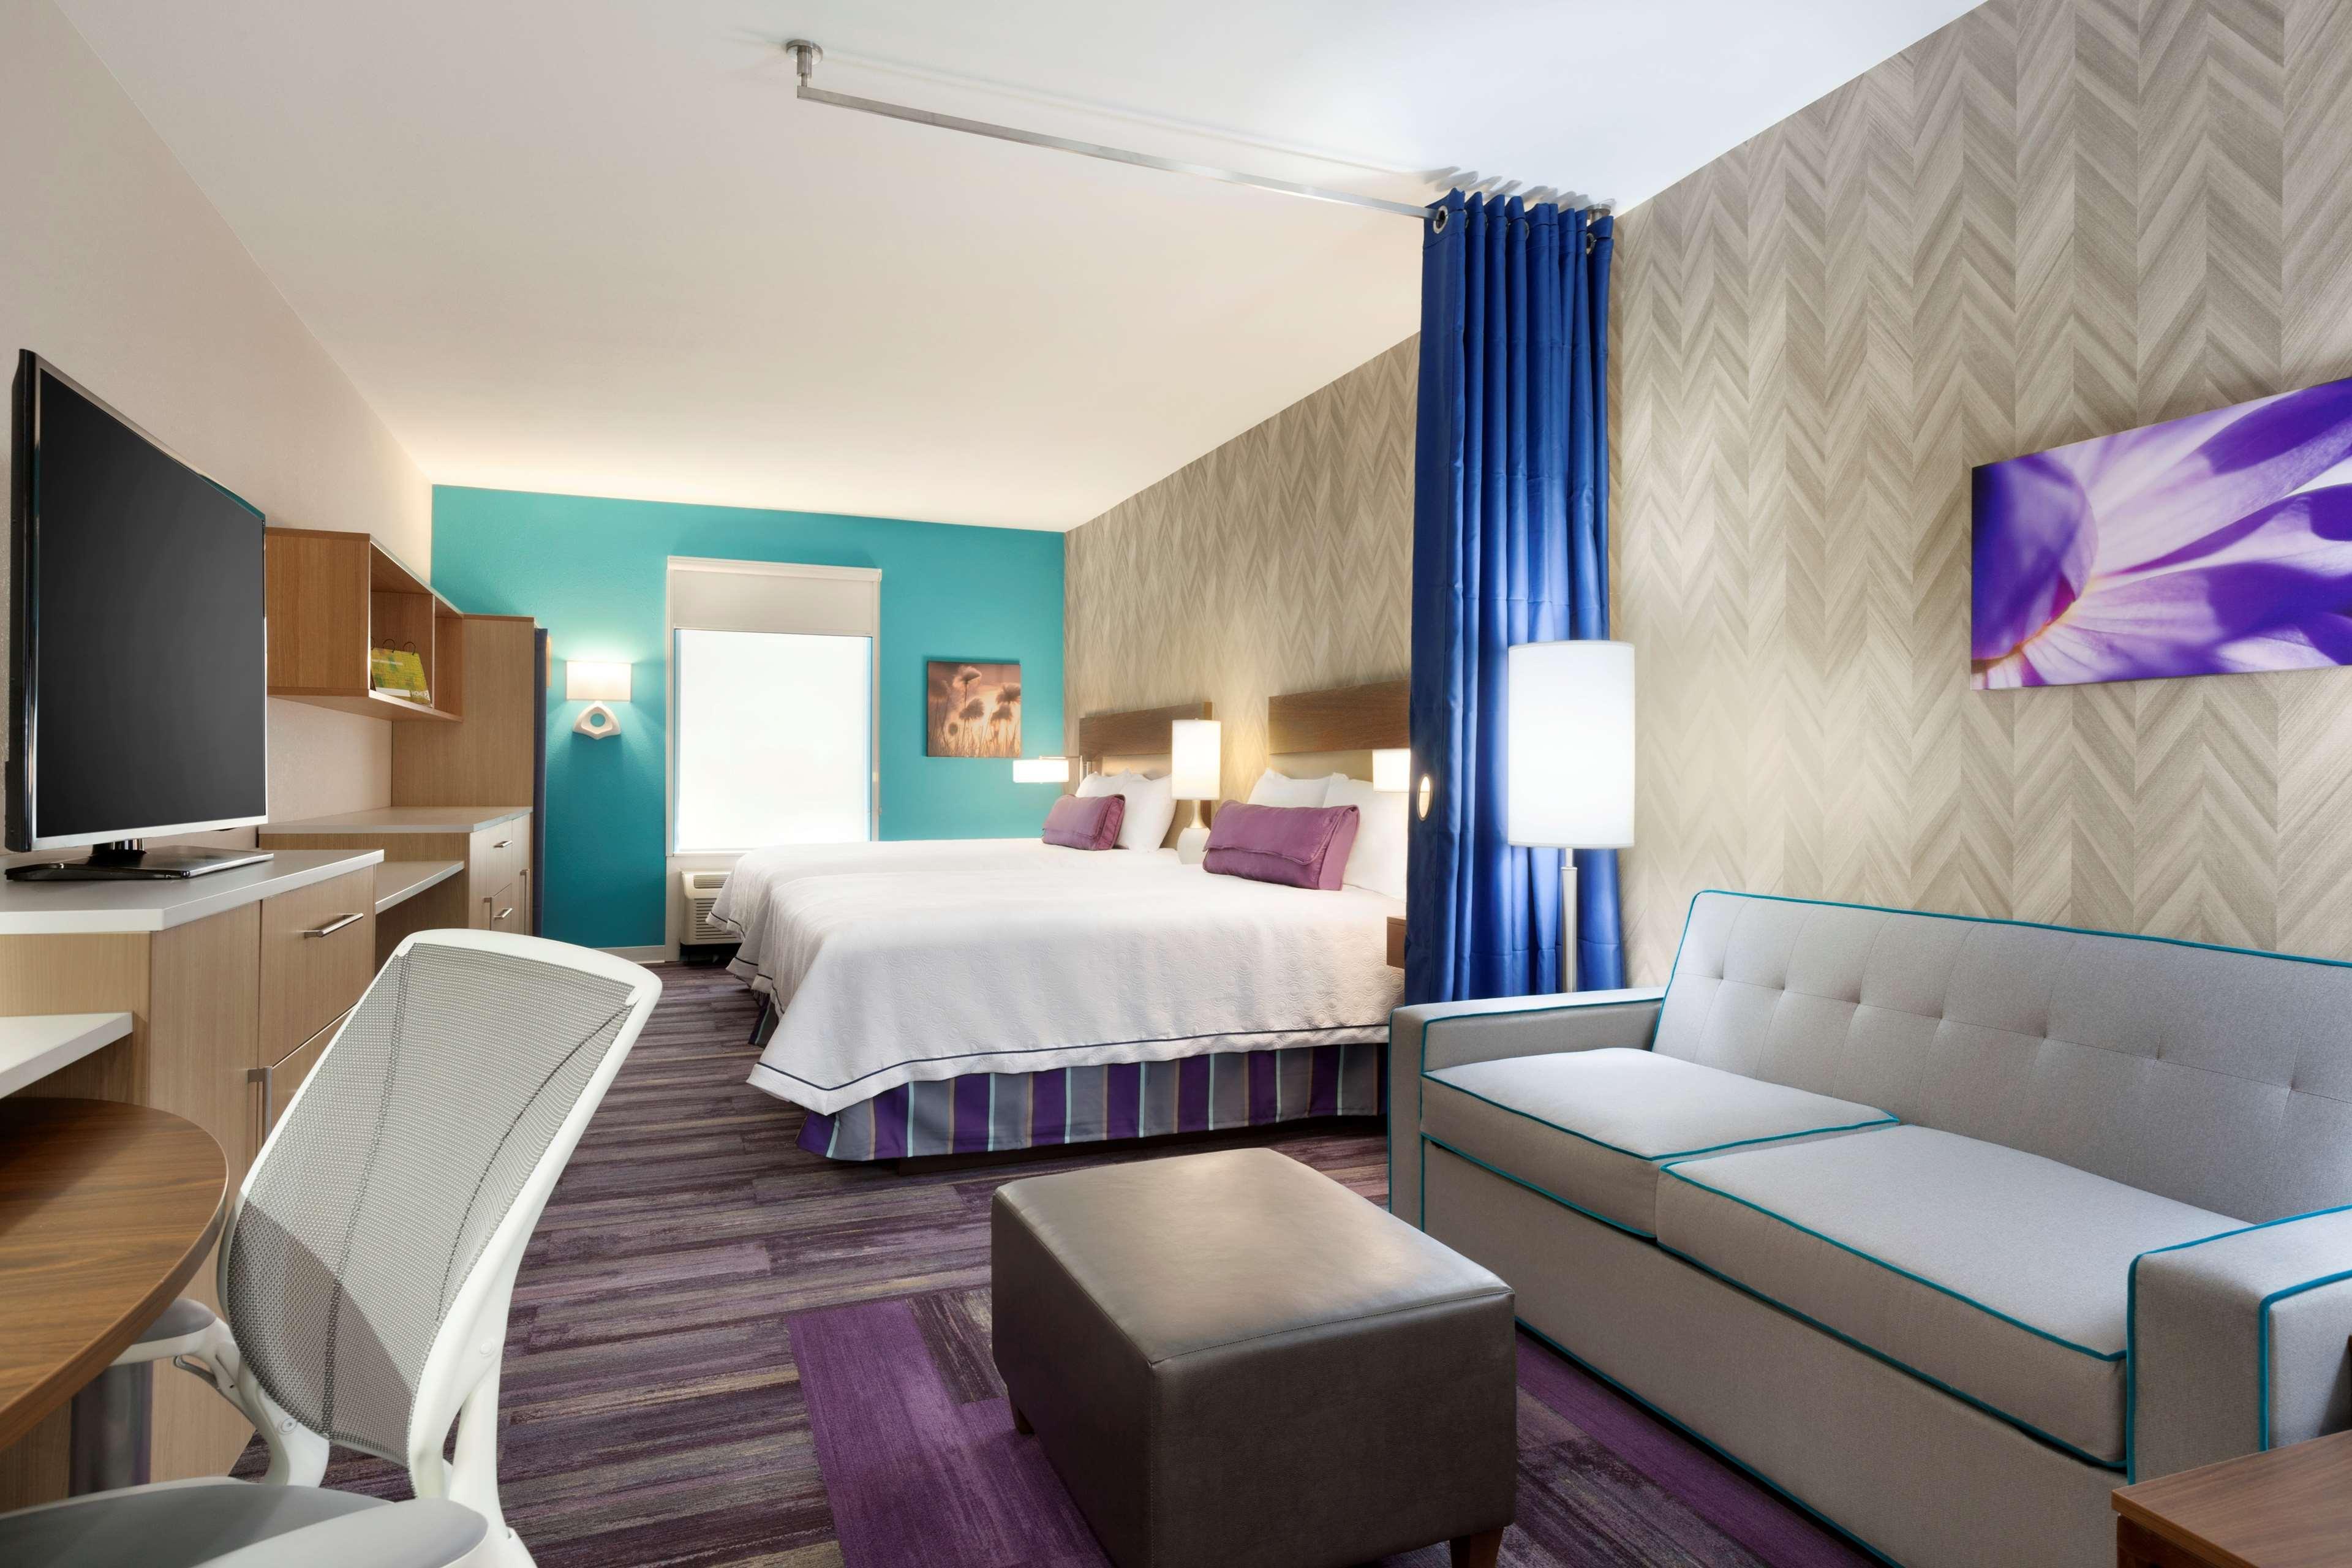 Home2 Suites by Hilton West Monroe image 9